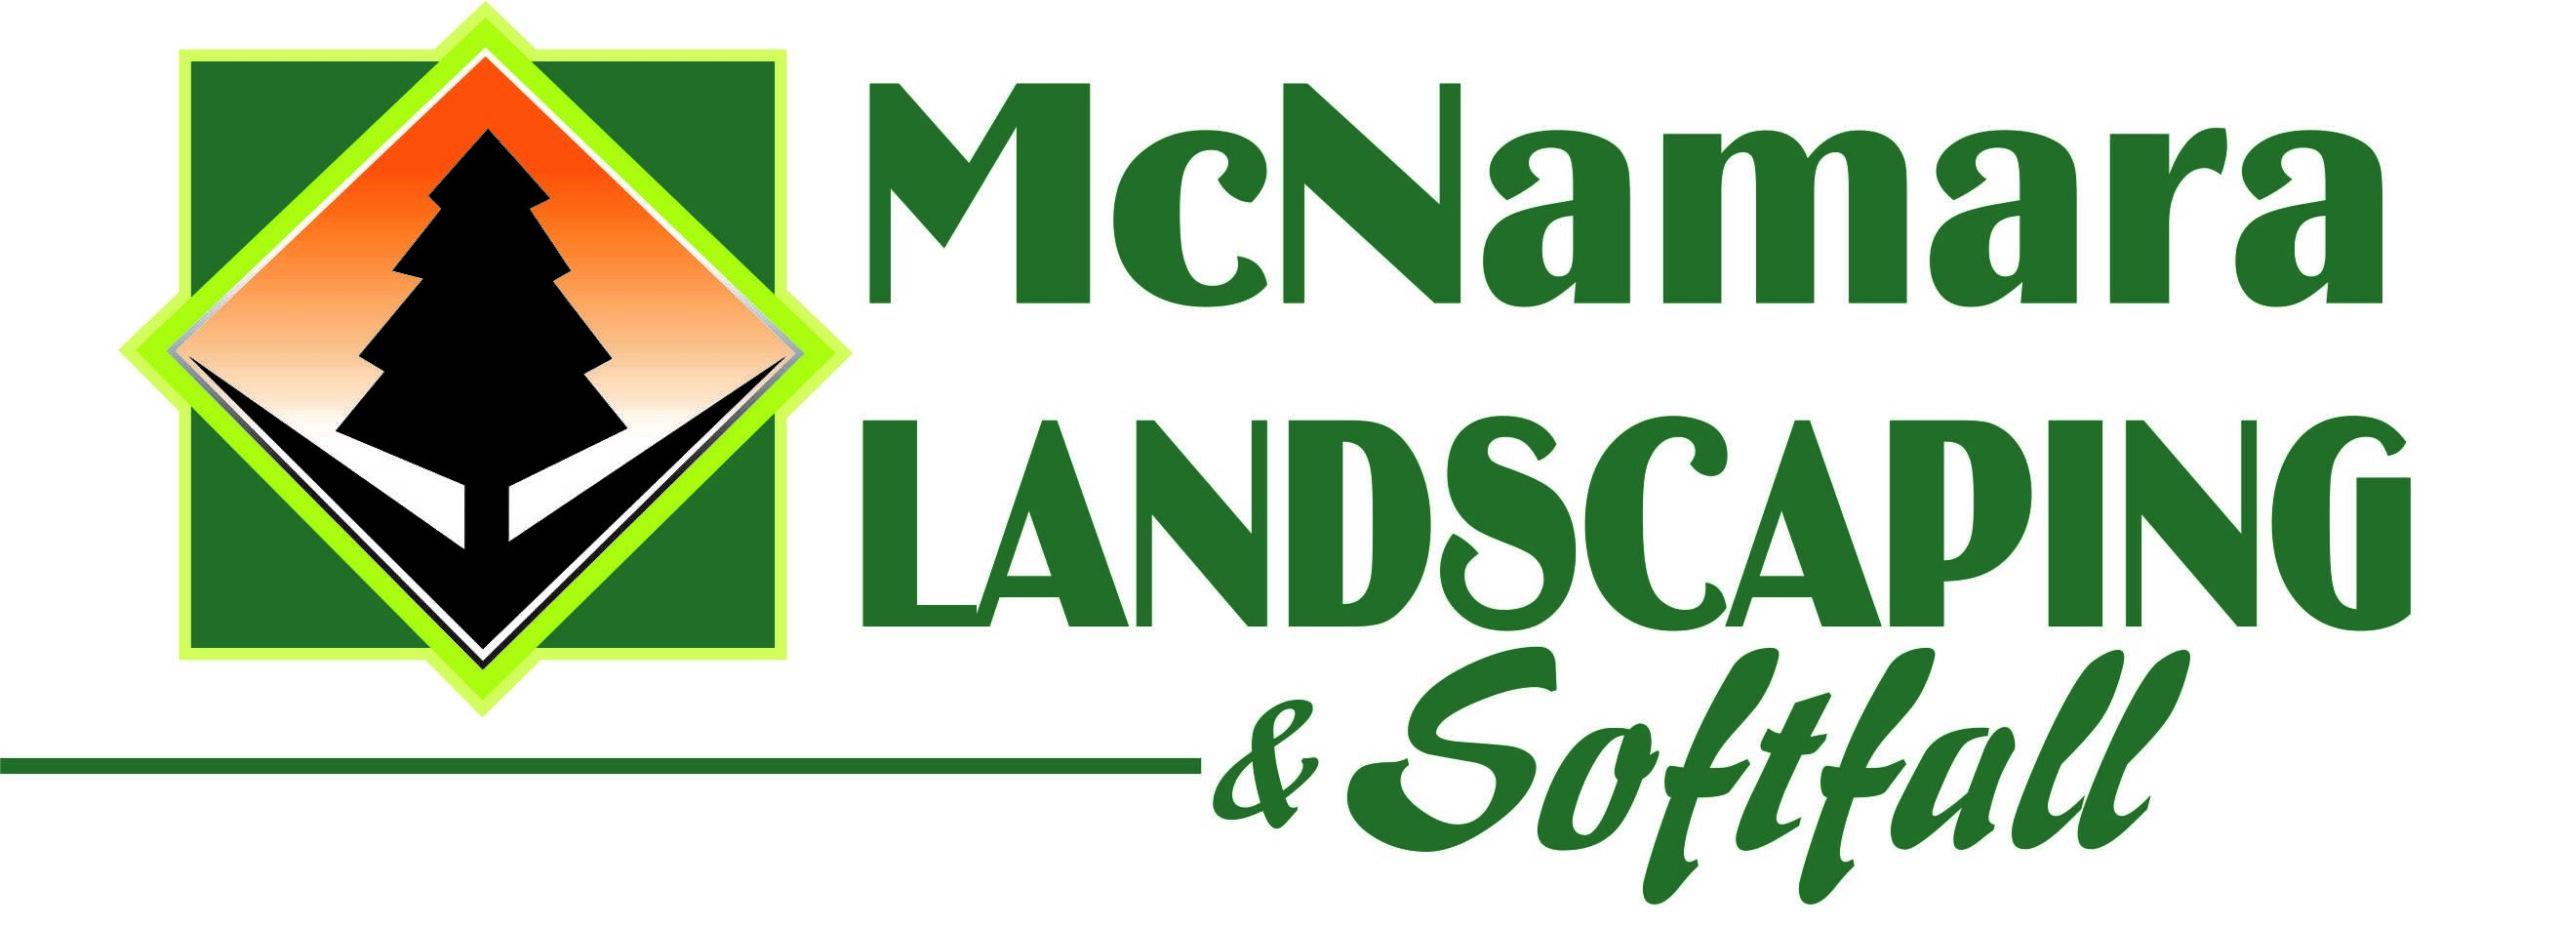 McNamara Landscaping & Softfall